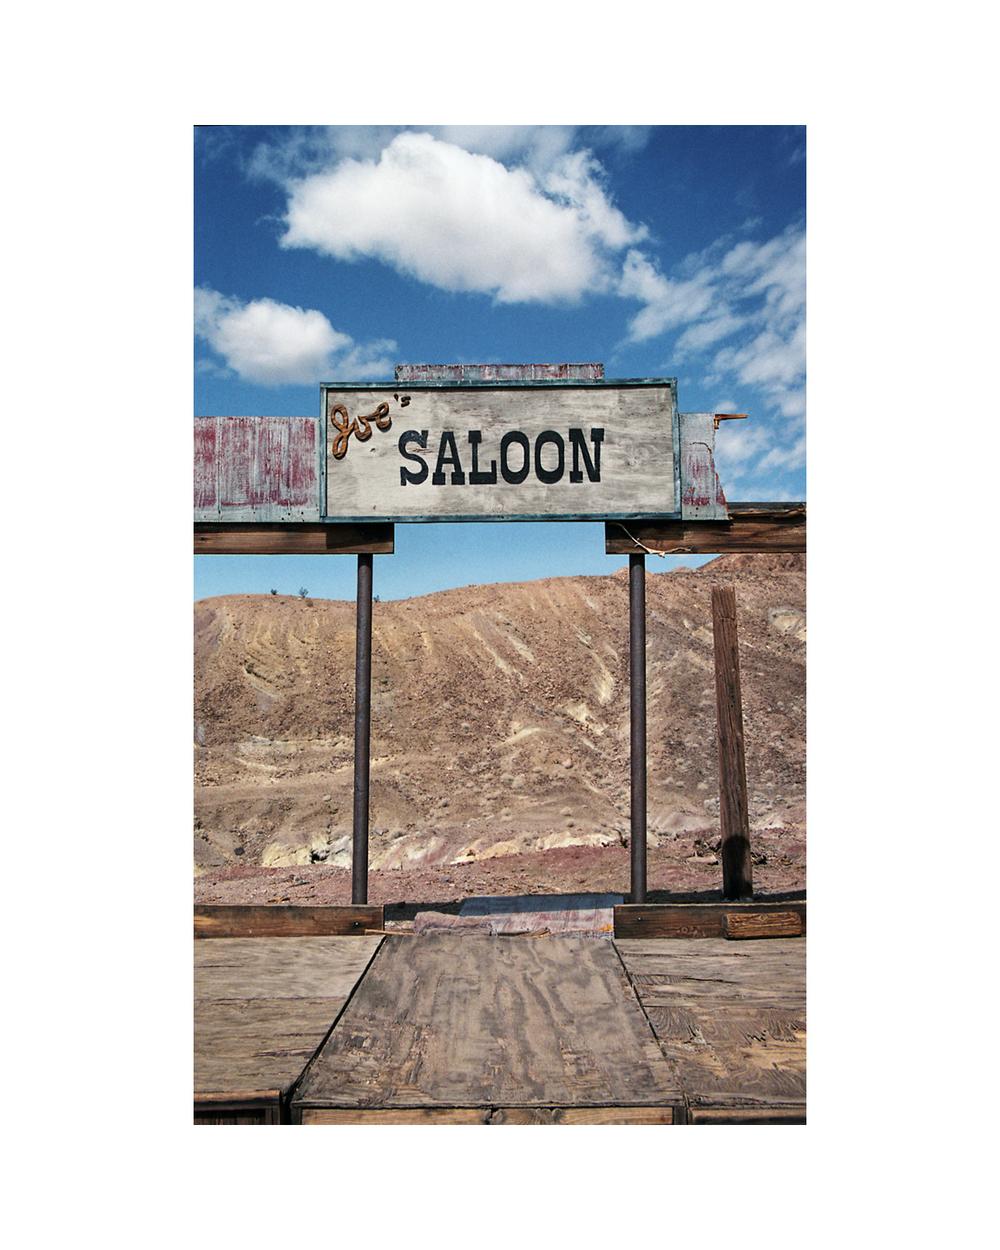 Joe's Saloon - Mojave Desert